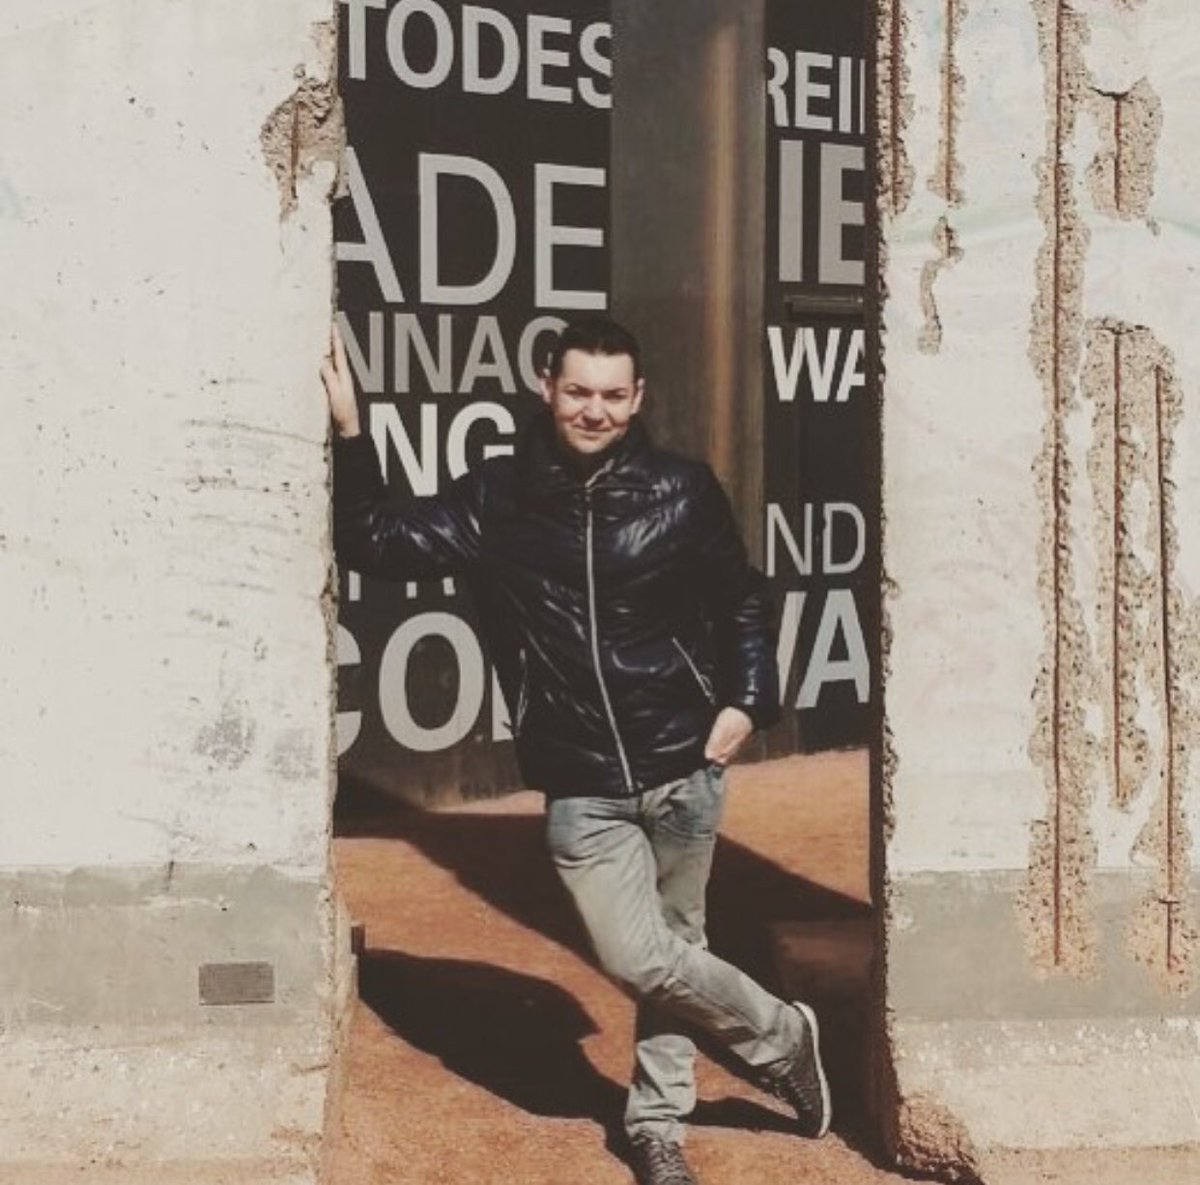 I resti del muro di Berlino #berlin #deutschland #holiday #vacation #photoftheday https://t.co/f3KLnPo8ay